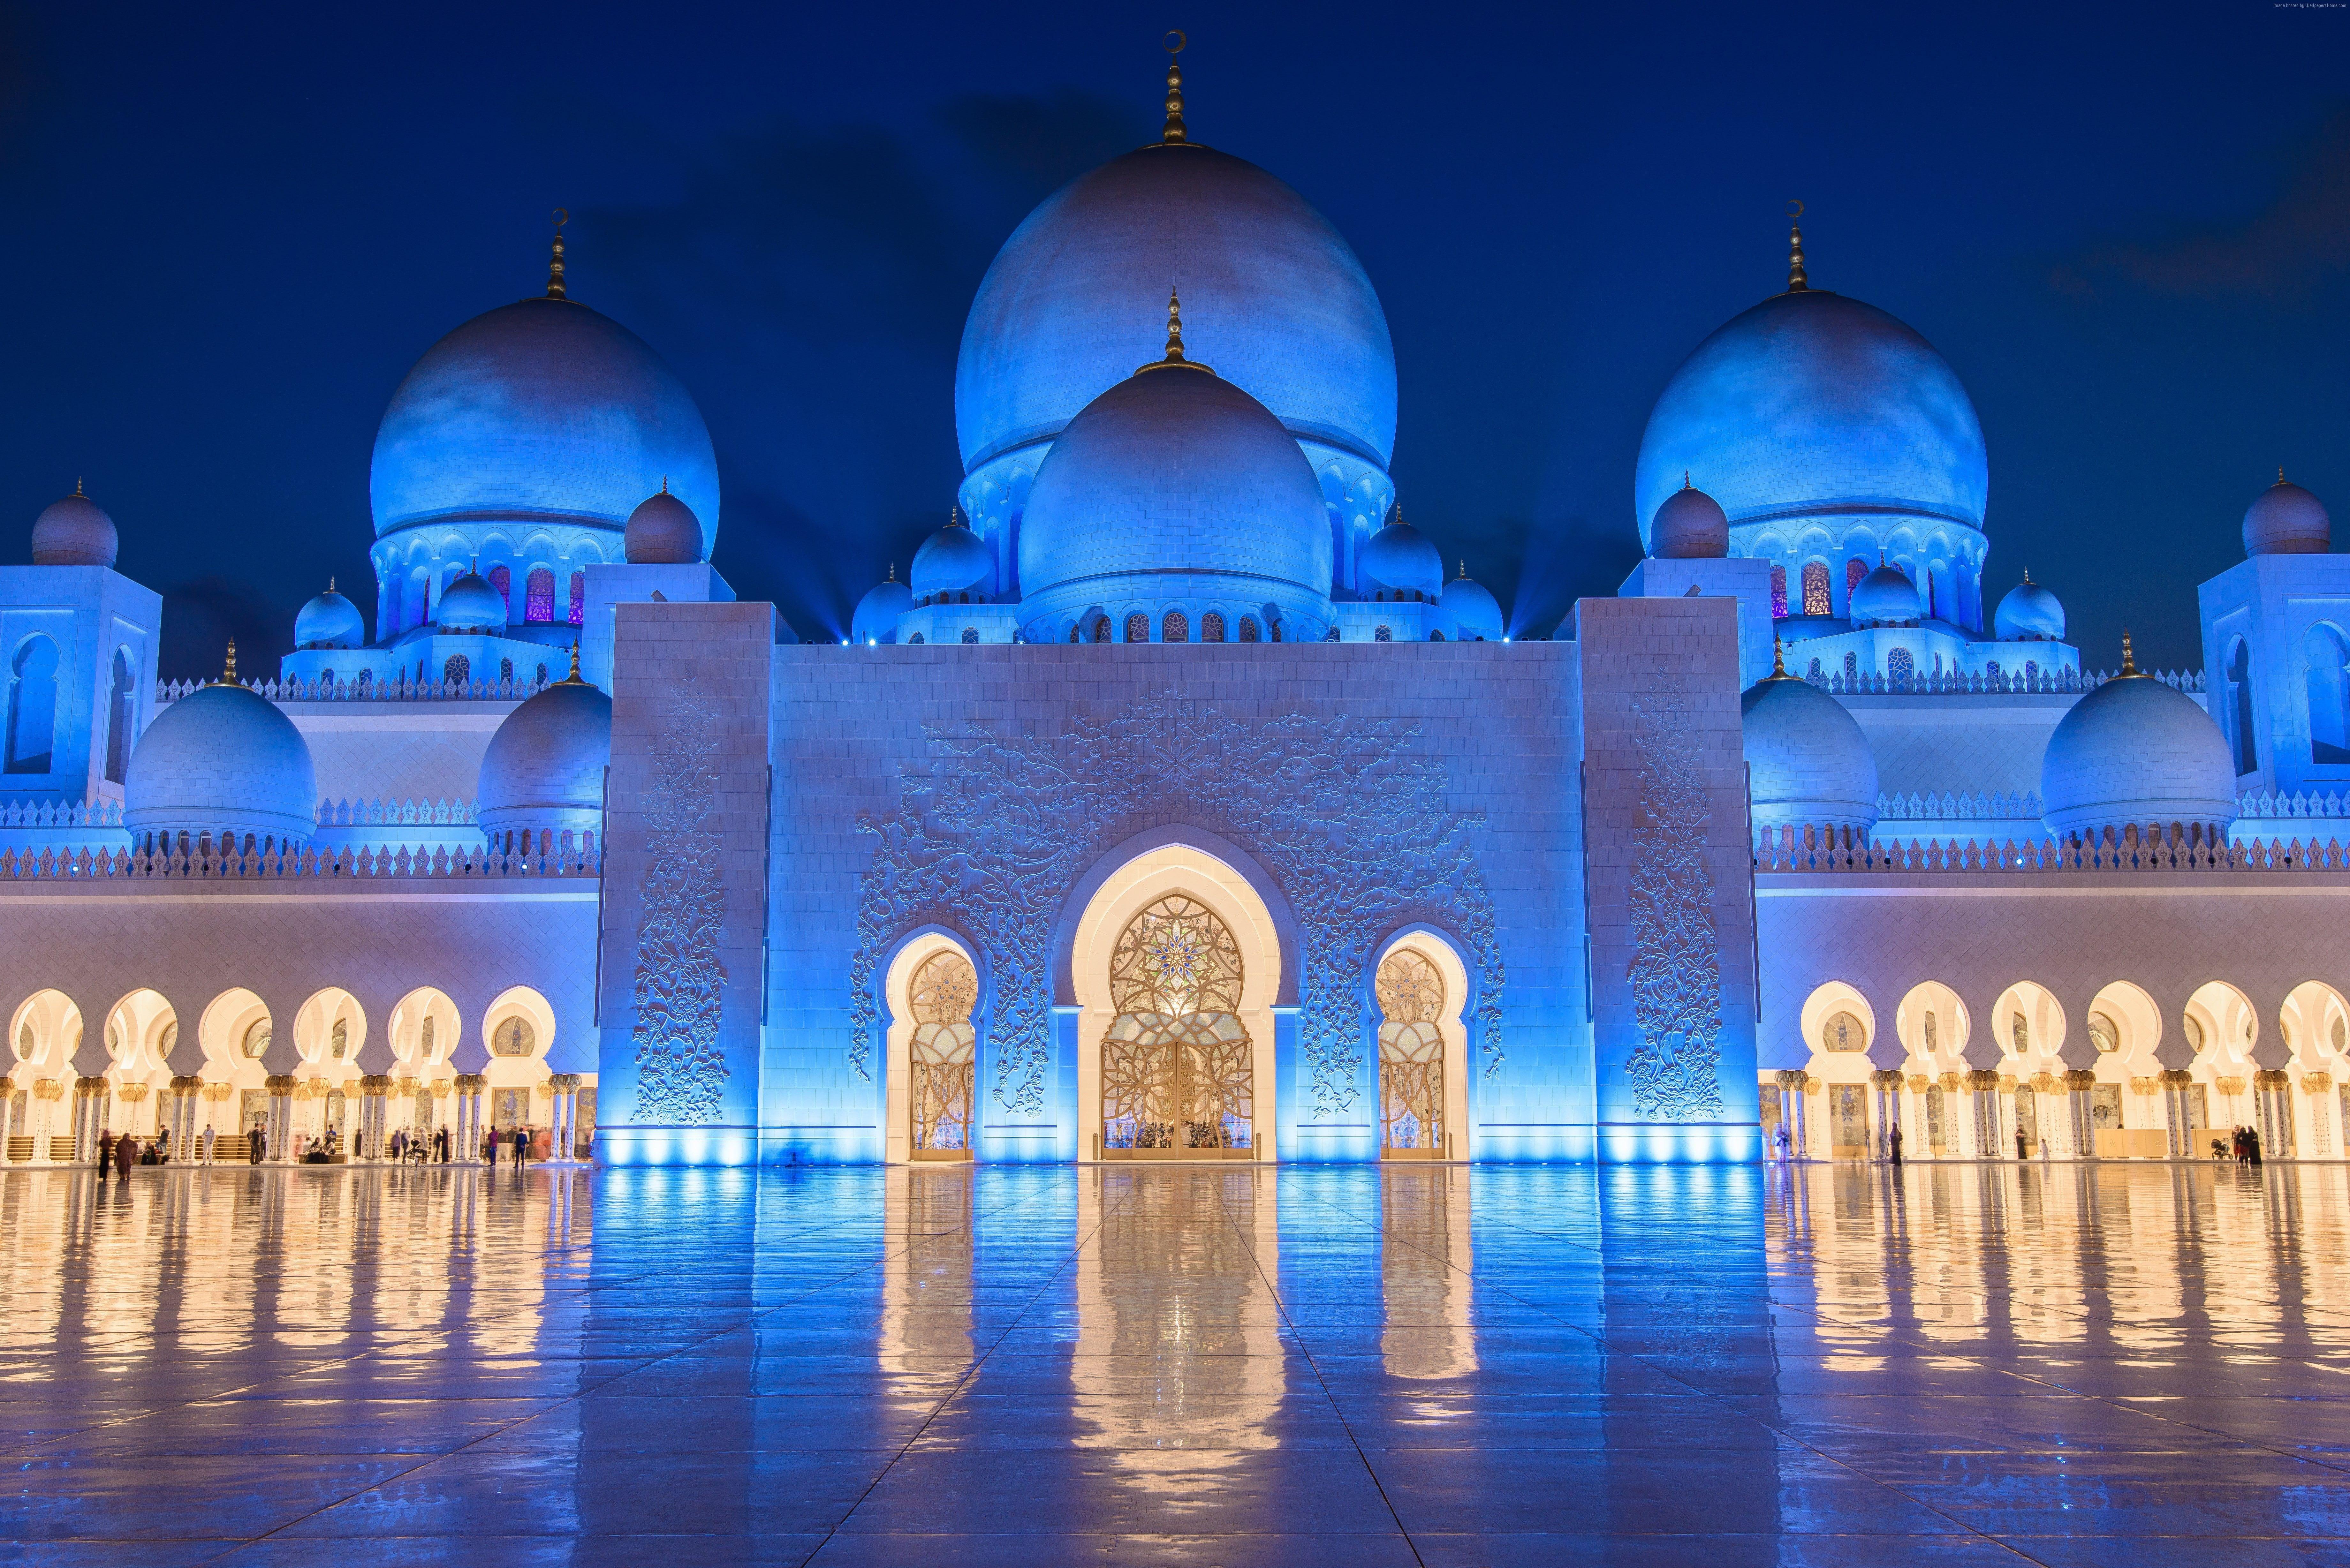 Abu Dhabi 8k Night Sheikh Zayed Mosque 5k Wallpaper Hdwallpaper Desktop Sheikh Zayed Grand Mosque Grand Mosque Mosque